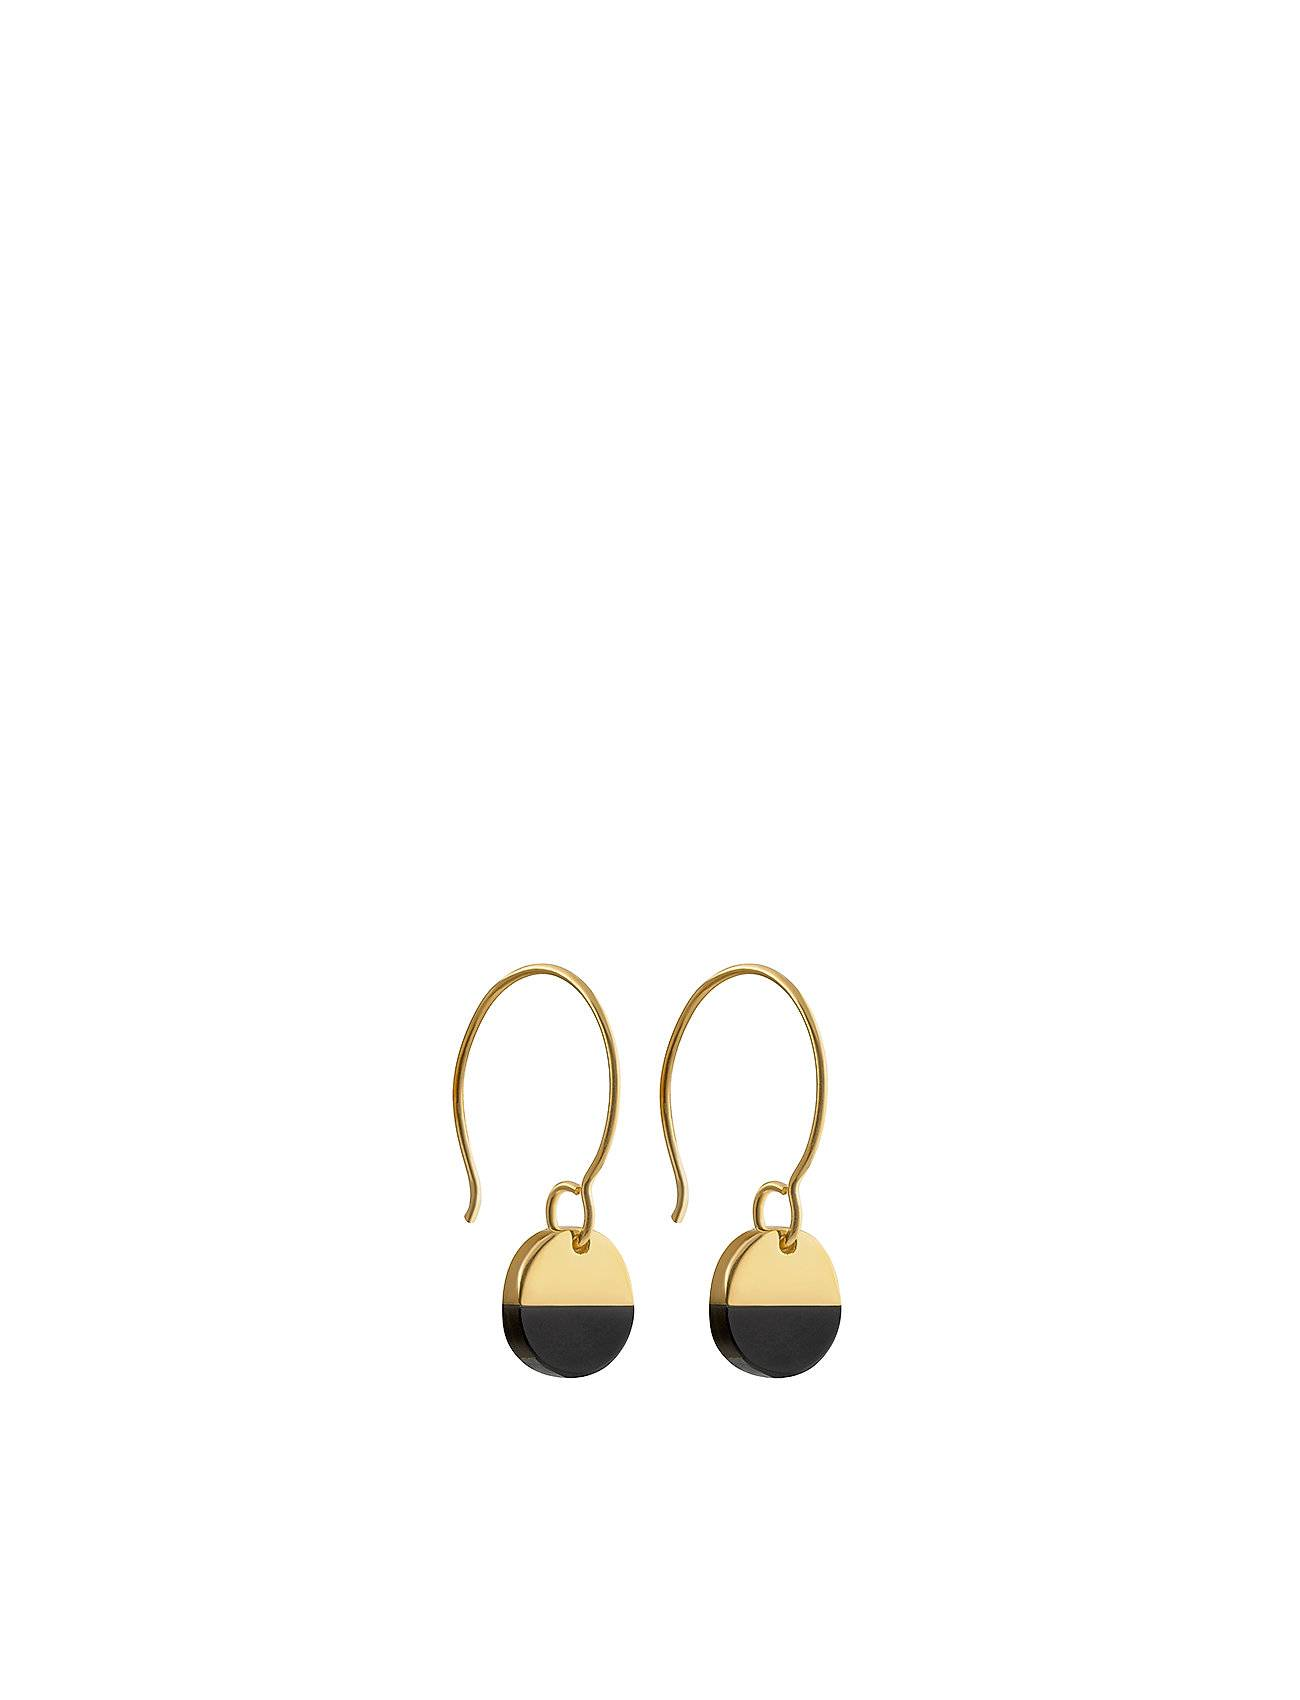 Syster P Dixxi Earrings Black Onyx